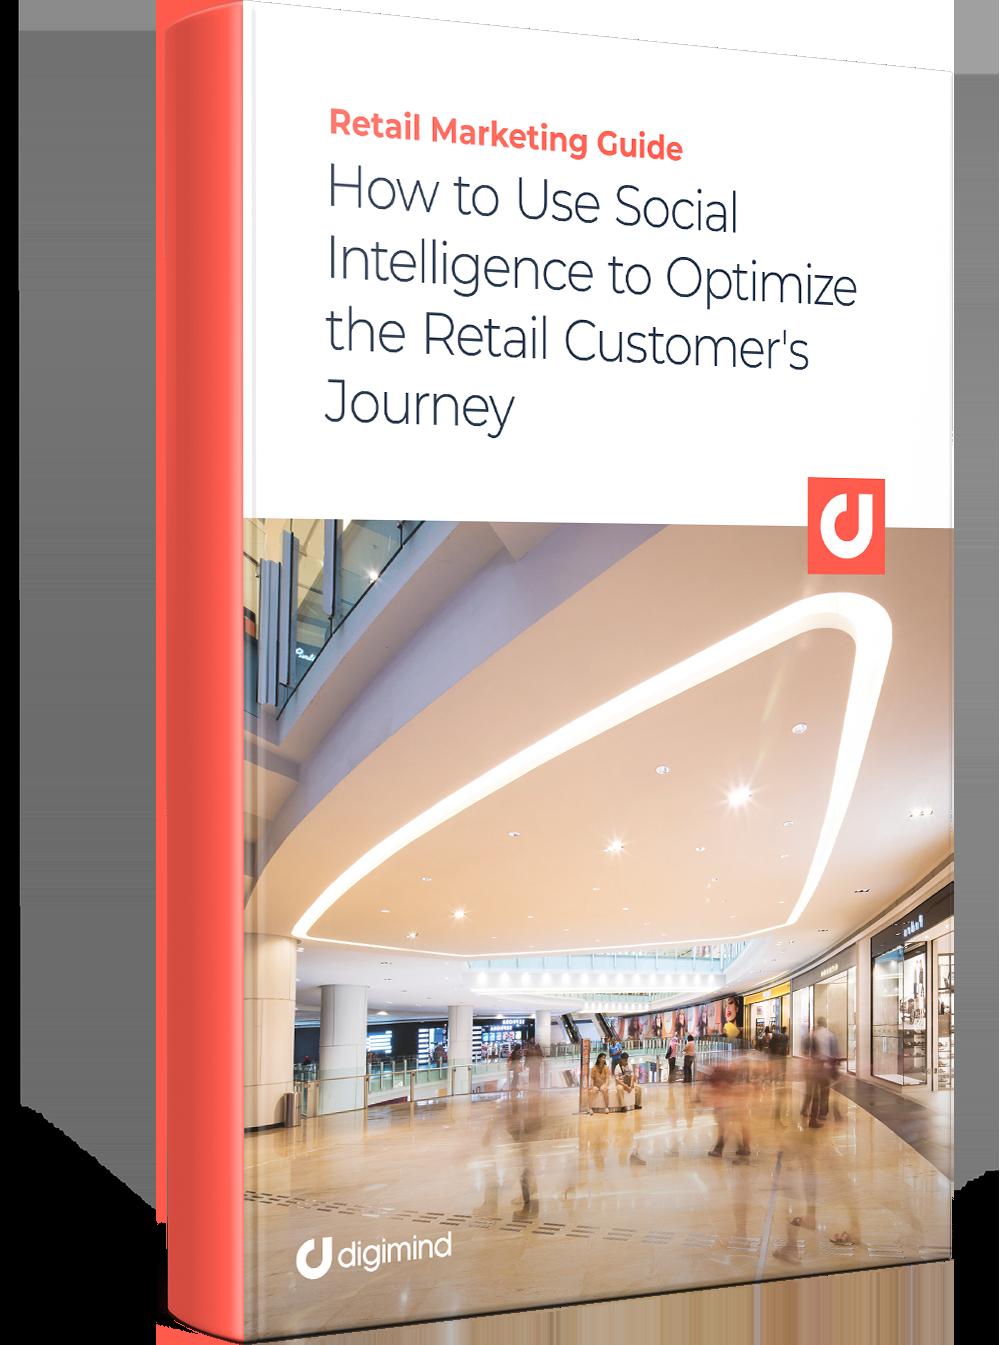 APAC - Retail Marketing Guide_3D BOOK